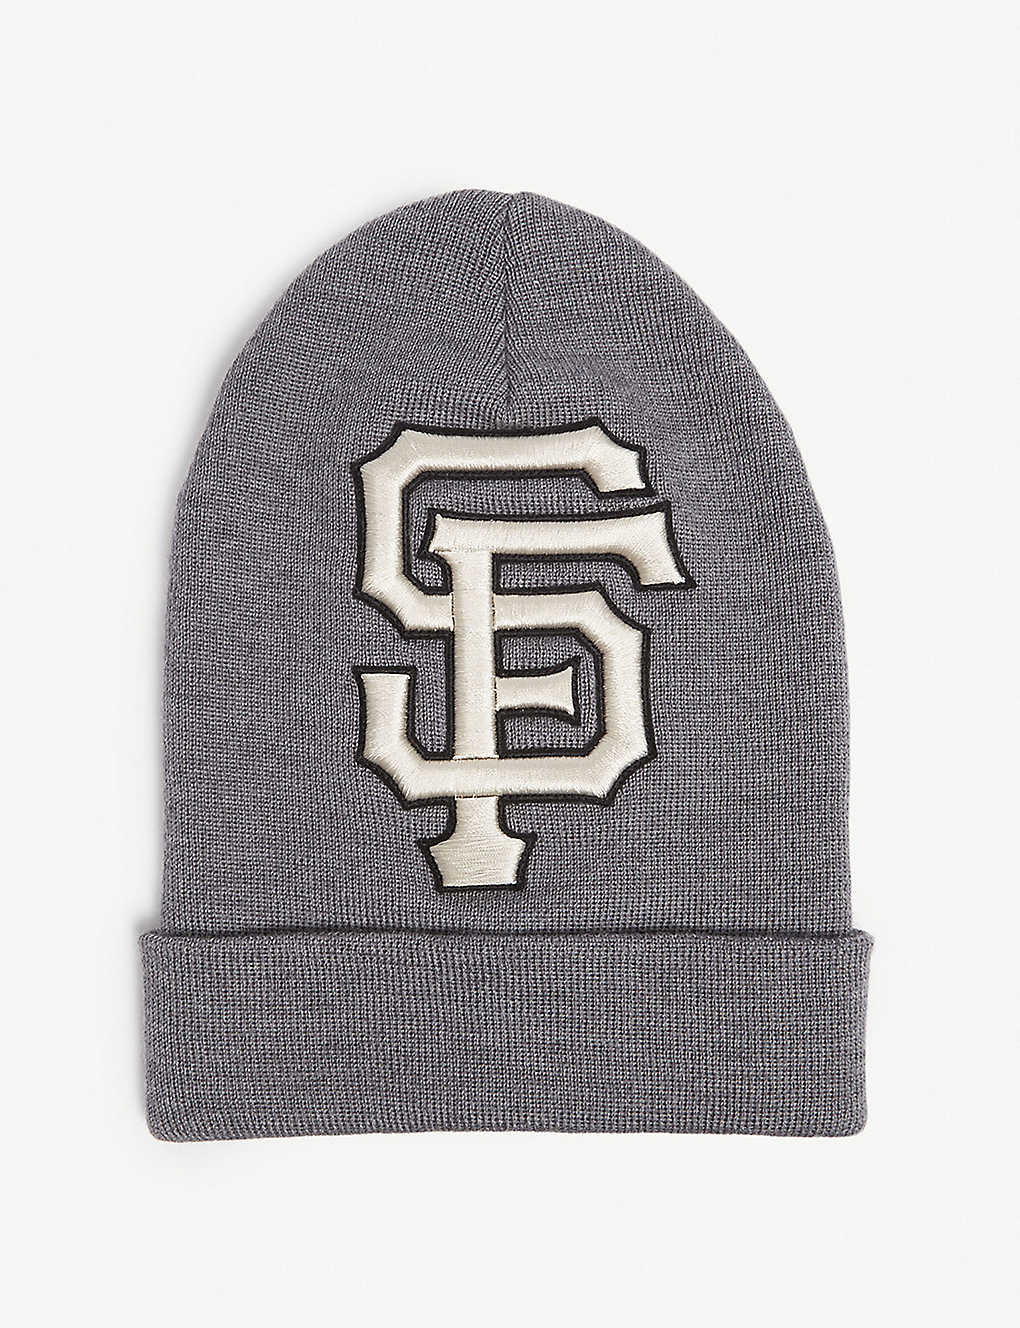 91f007a0a37ca GUCCI - San Francisco Giants knitted wool beanie